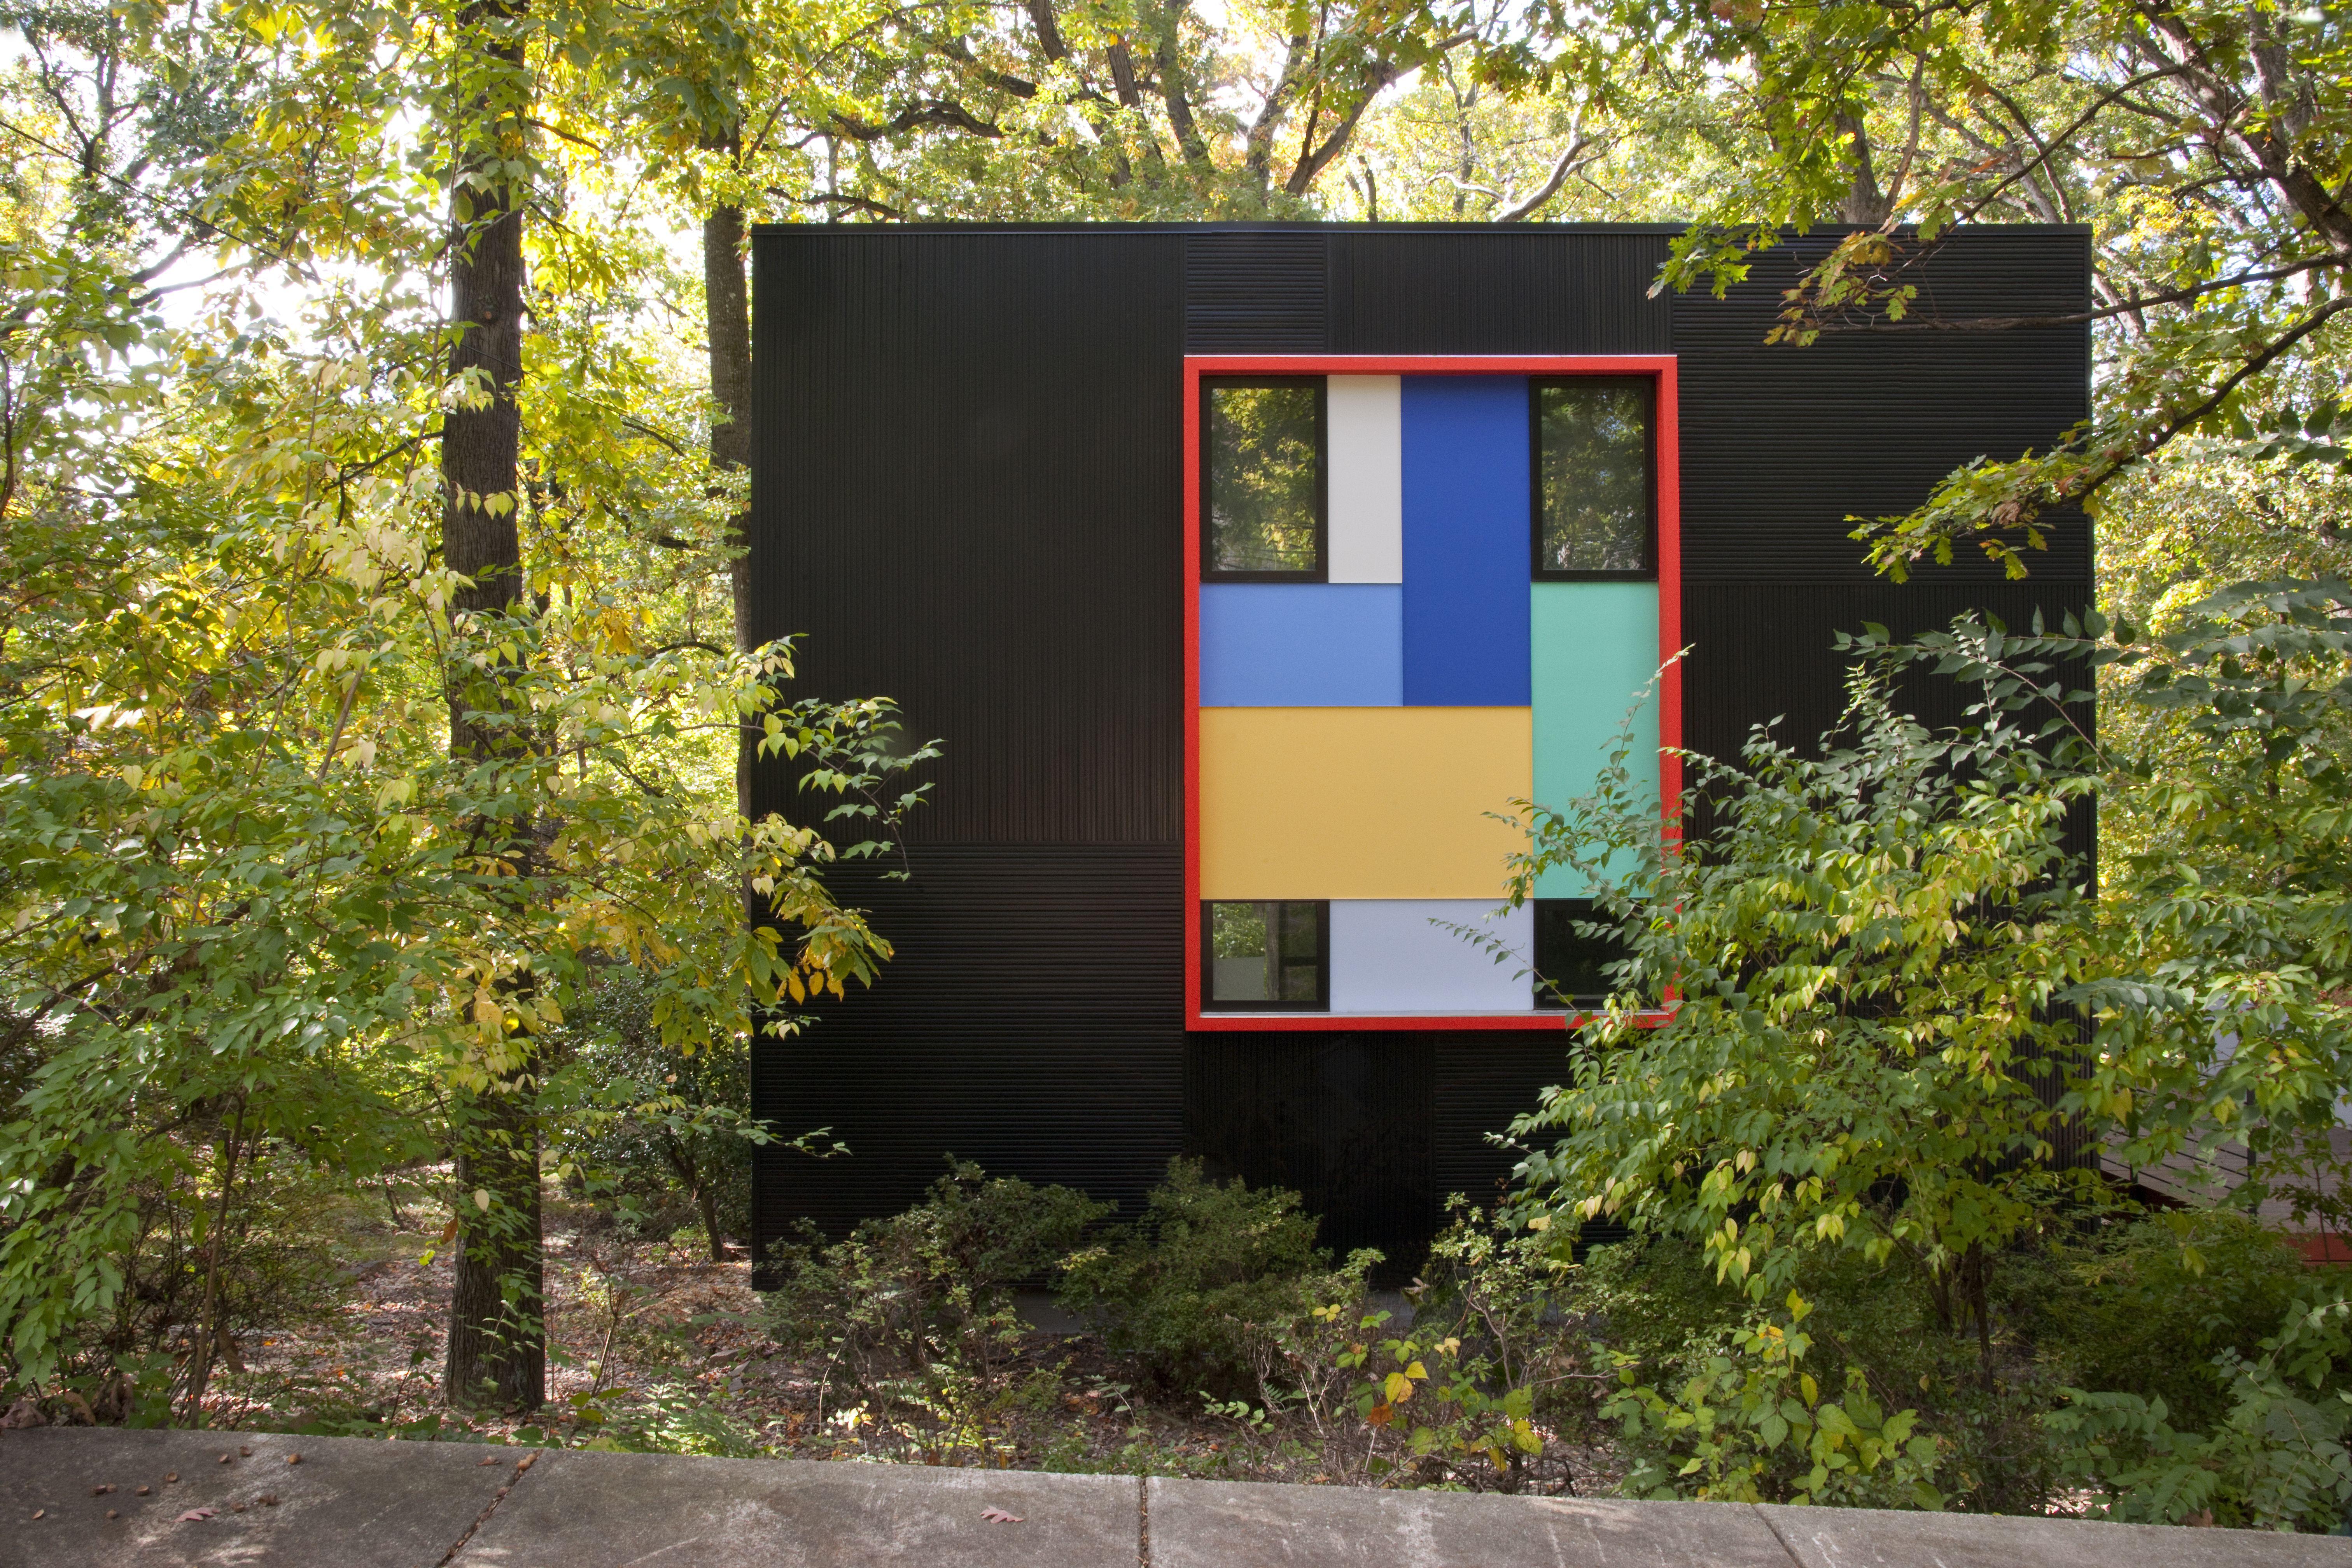 Renovation transforms drab Maryland house into a 'magic box'